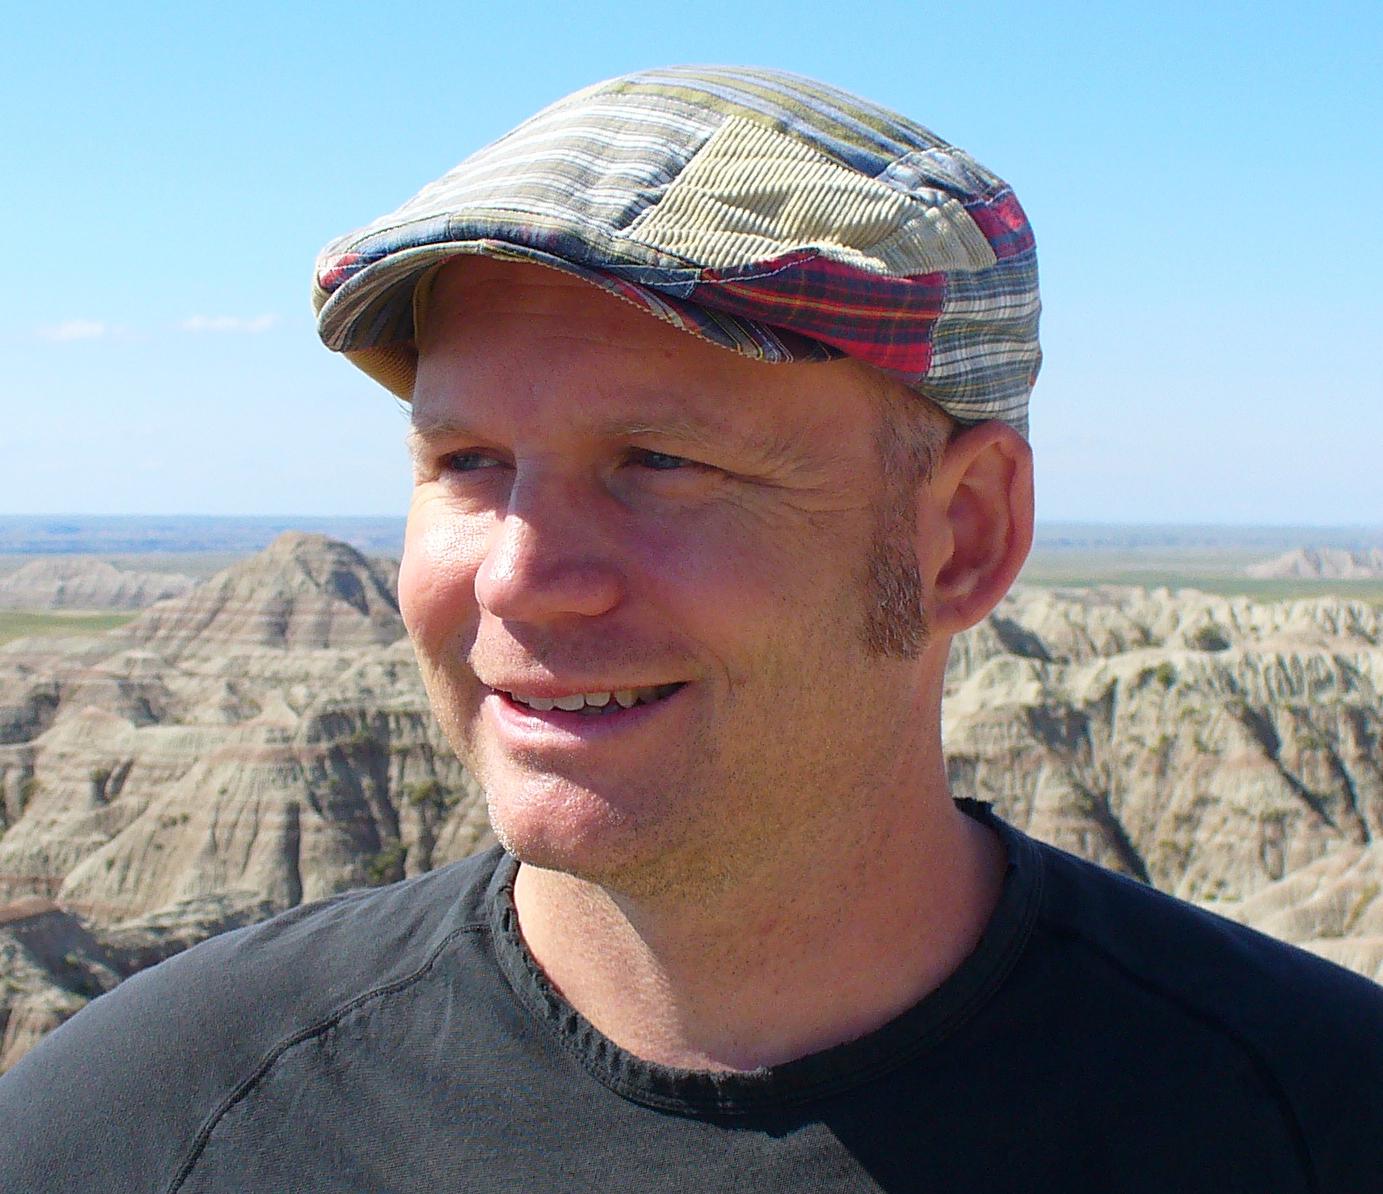 Chad_Author_Badlands.jpg